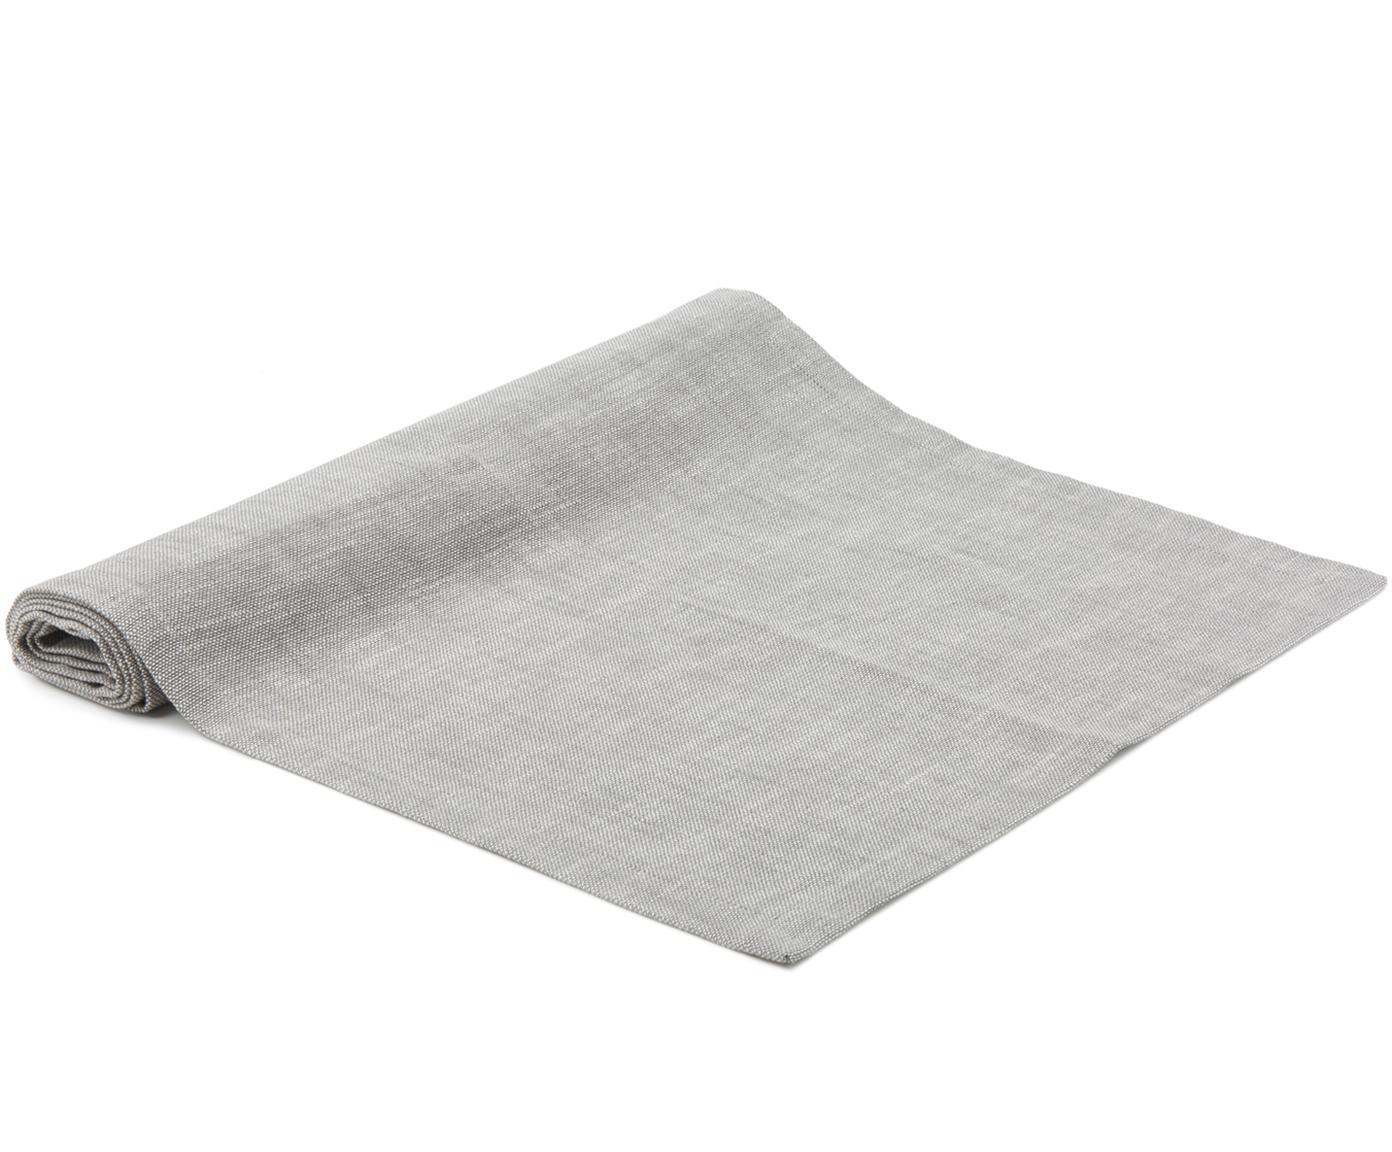 Runner da tavolo Tonnika, Cotone, Grigio, Larg. 45 x Lung. 150 cm